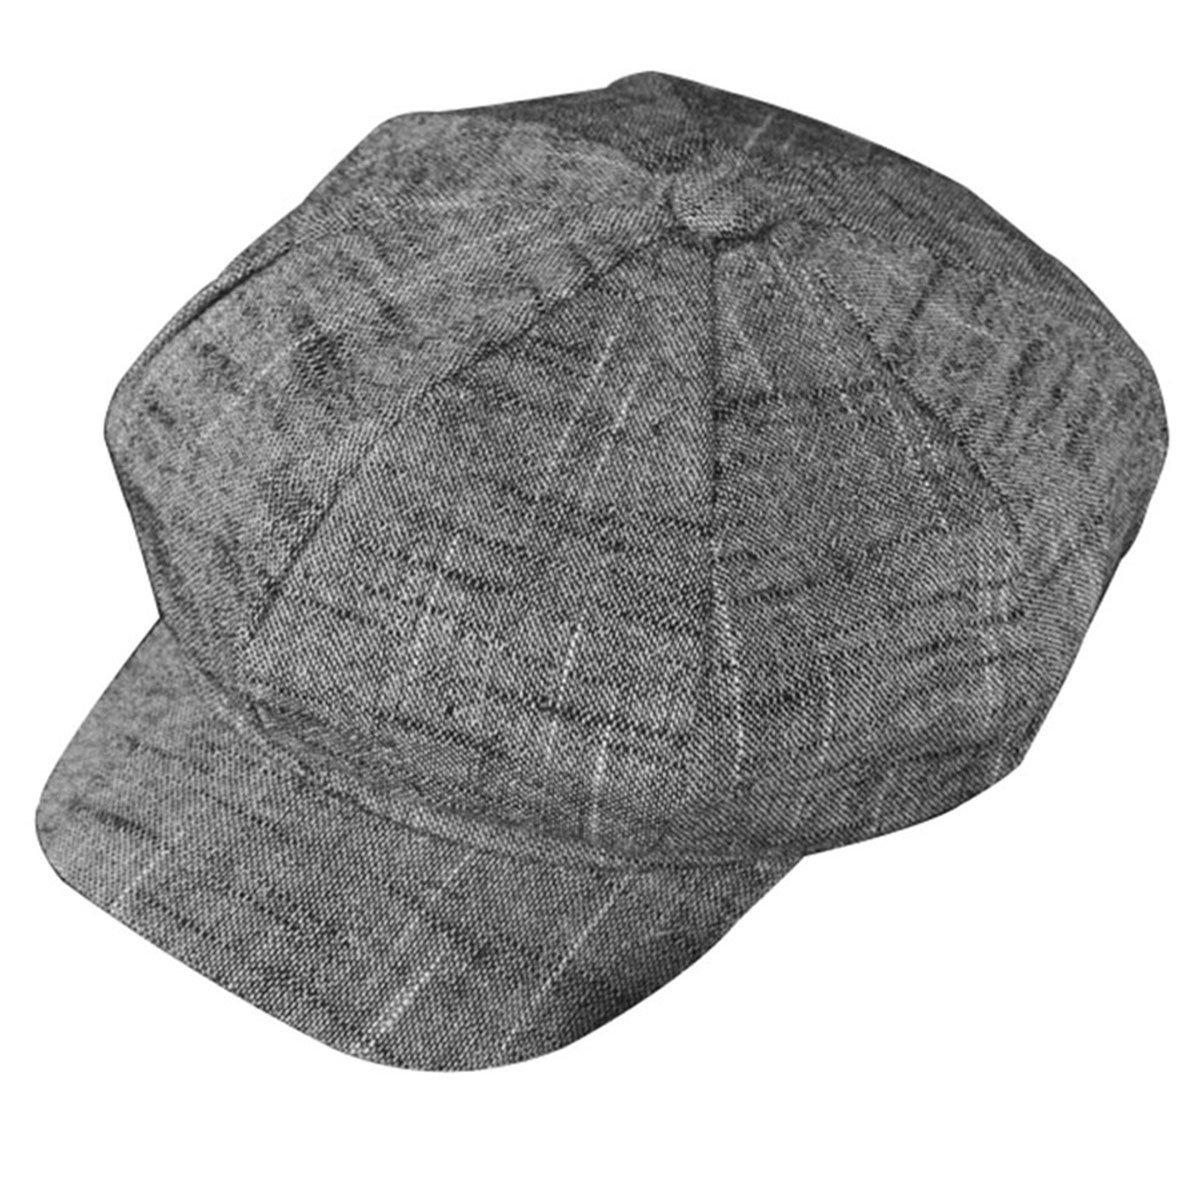 ZLS Women s Gatsby Newsboy Hat Cotton Linen Blend Painter Caps at Amazon  Women s Clothing store  01ca2d1d17d